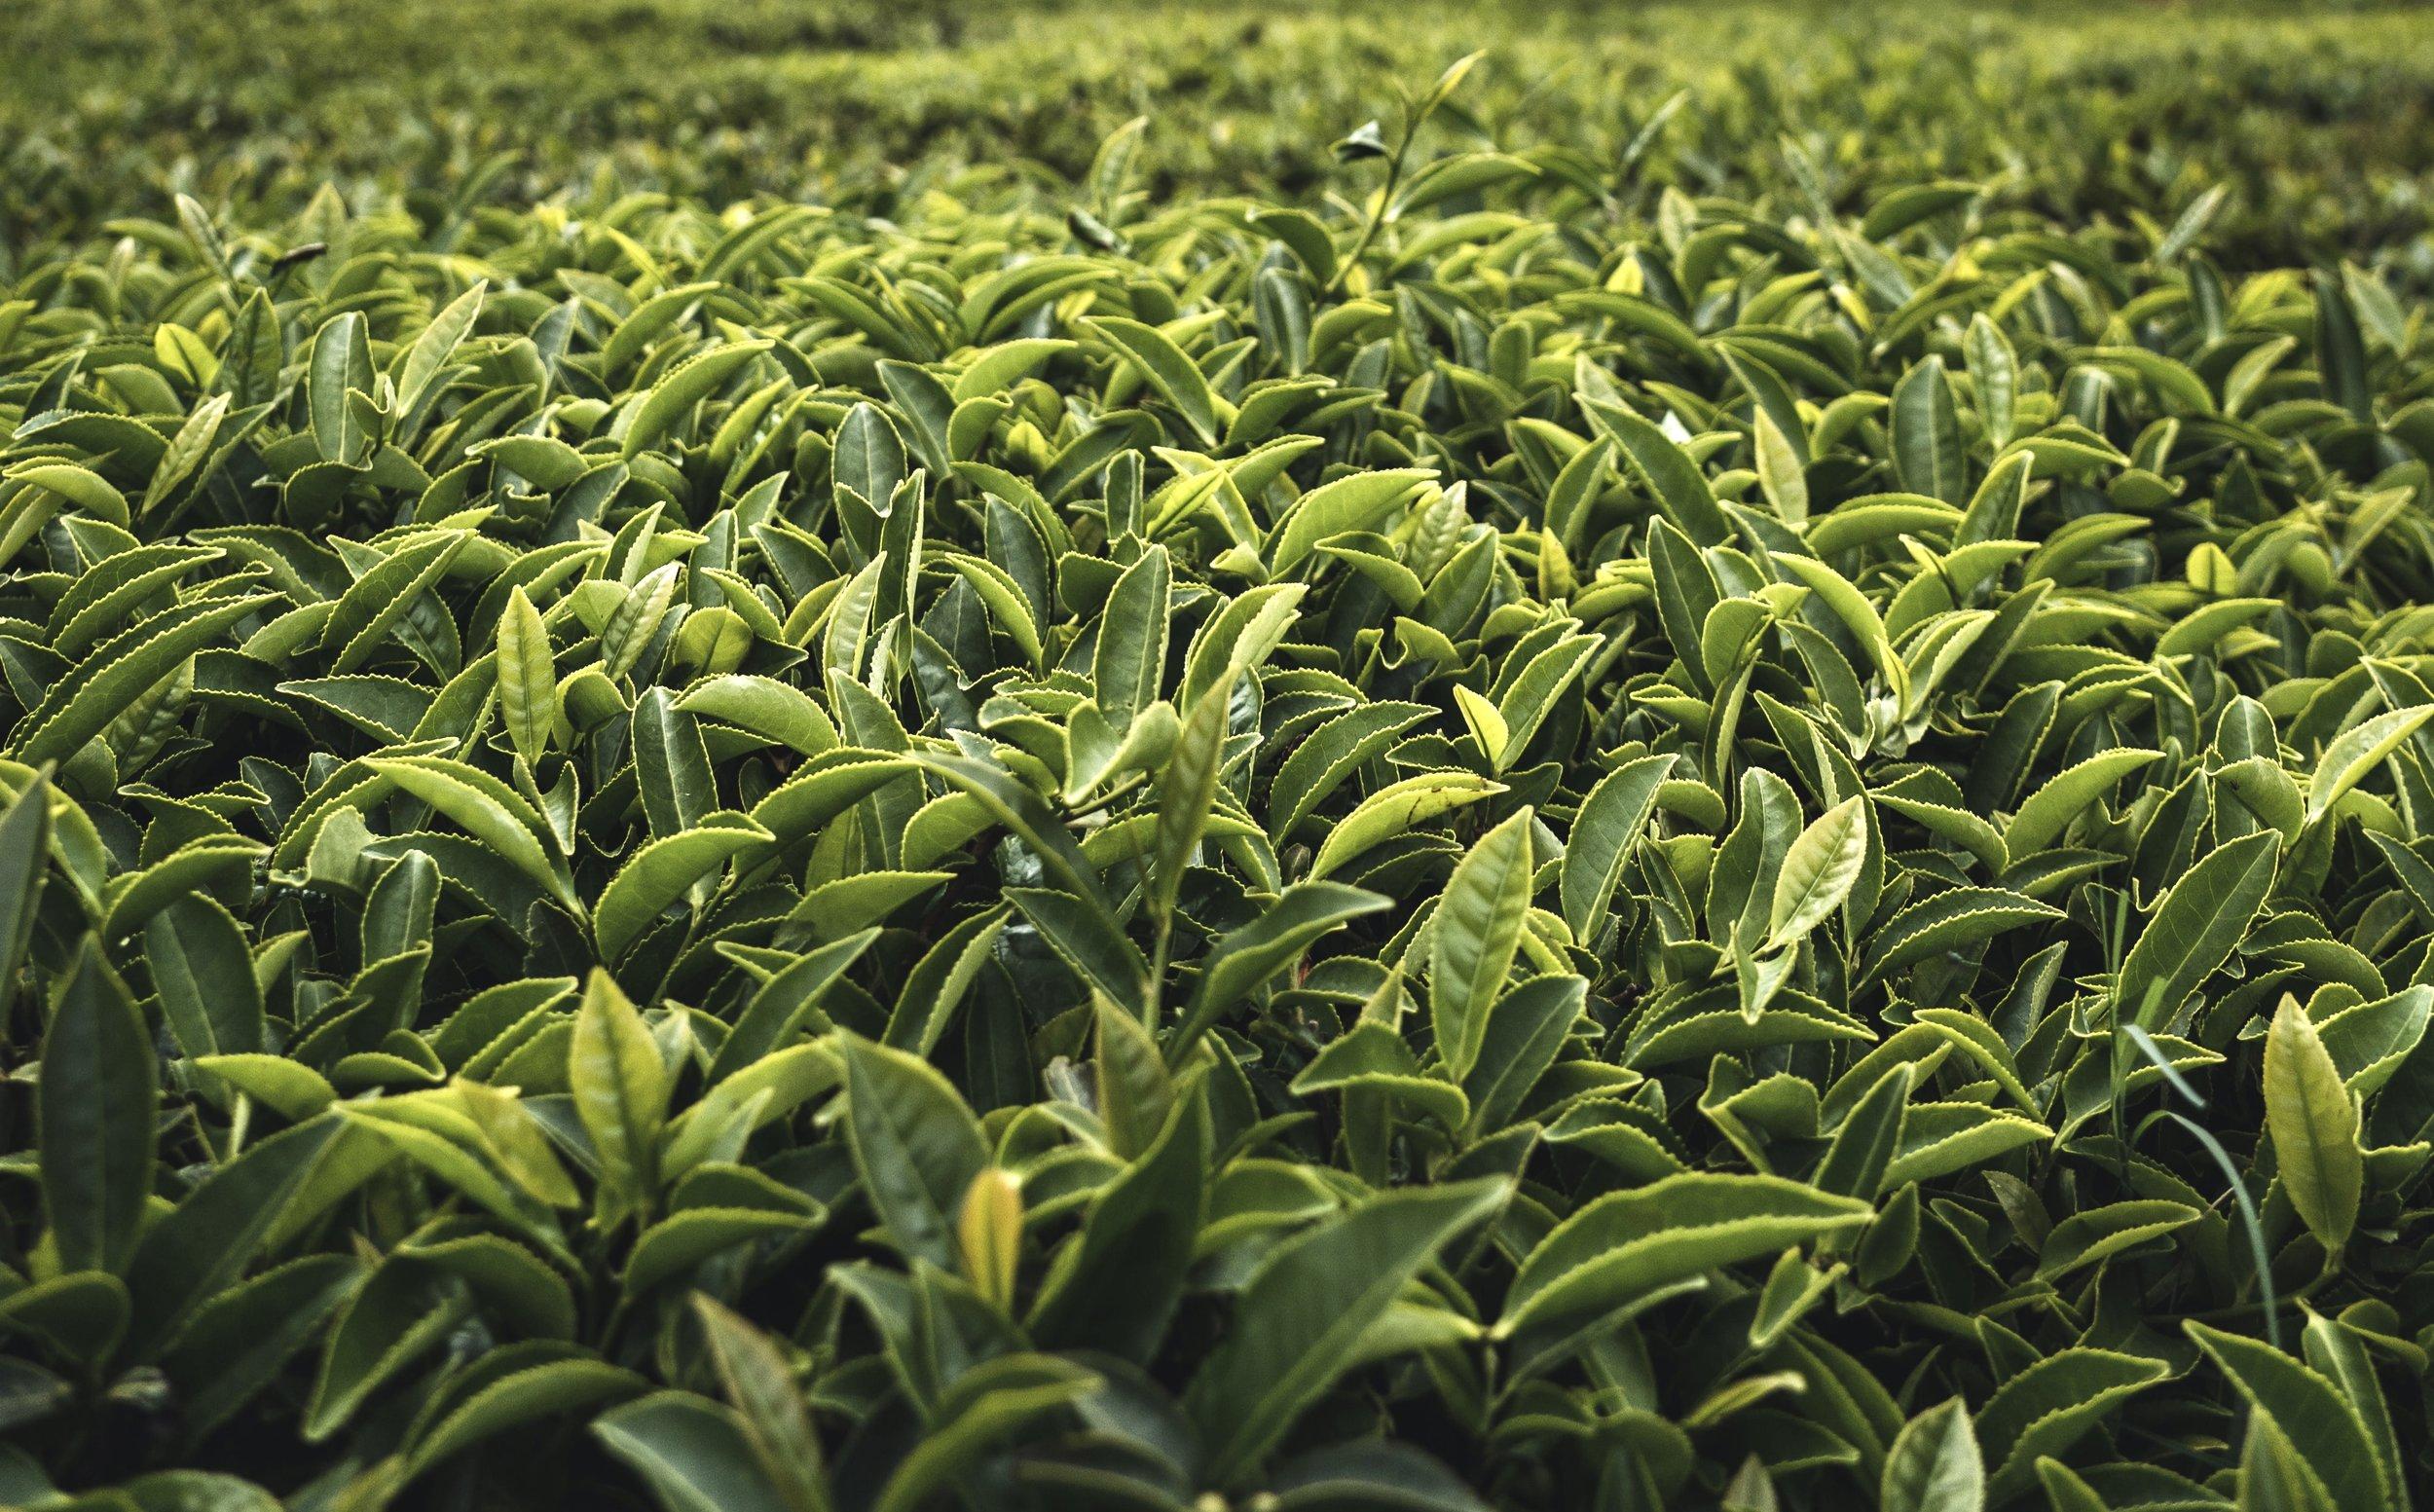 Nordic Honey_Health Benefits of Green tea__tea_plantation_tea_leaves_Green Tea with Peppermint & Strawberries_jar with cork